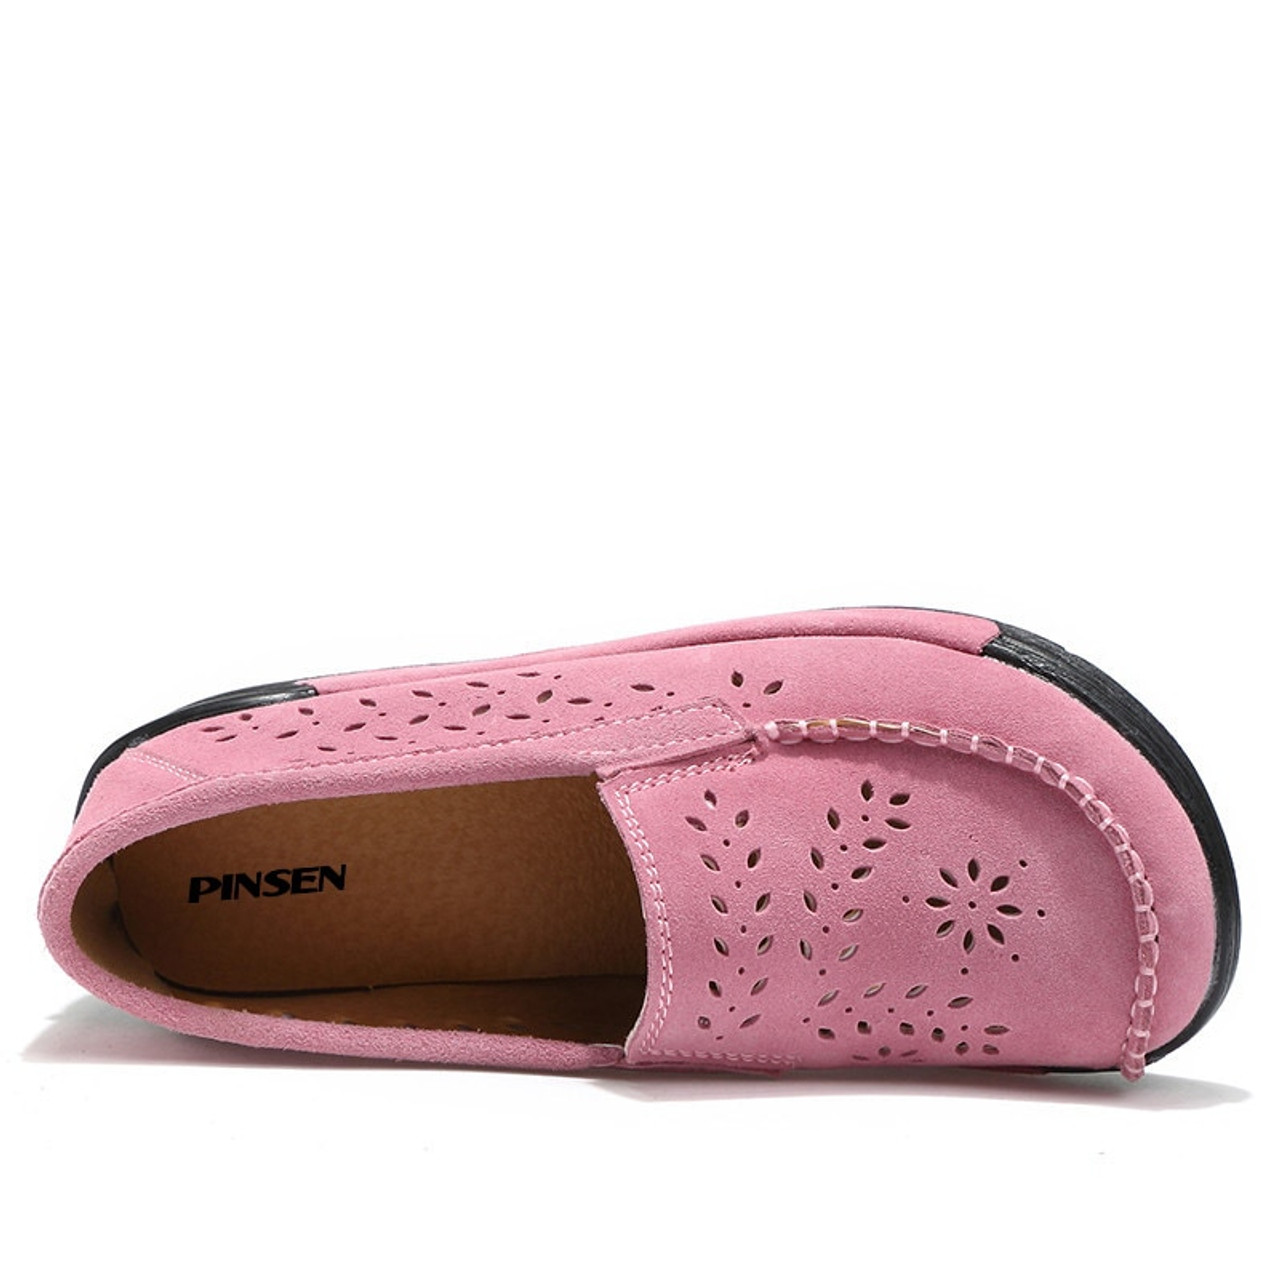 b9e259fd4bdb ... PINSEN Summer Women Casual Shoes Suede Leather Slip-On Women Flats  Platform Shoes Woman Moccasins ...